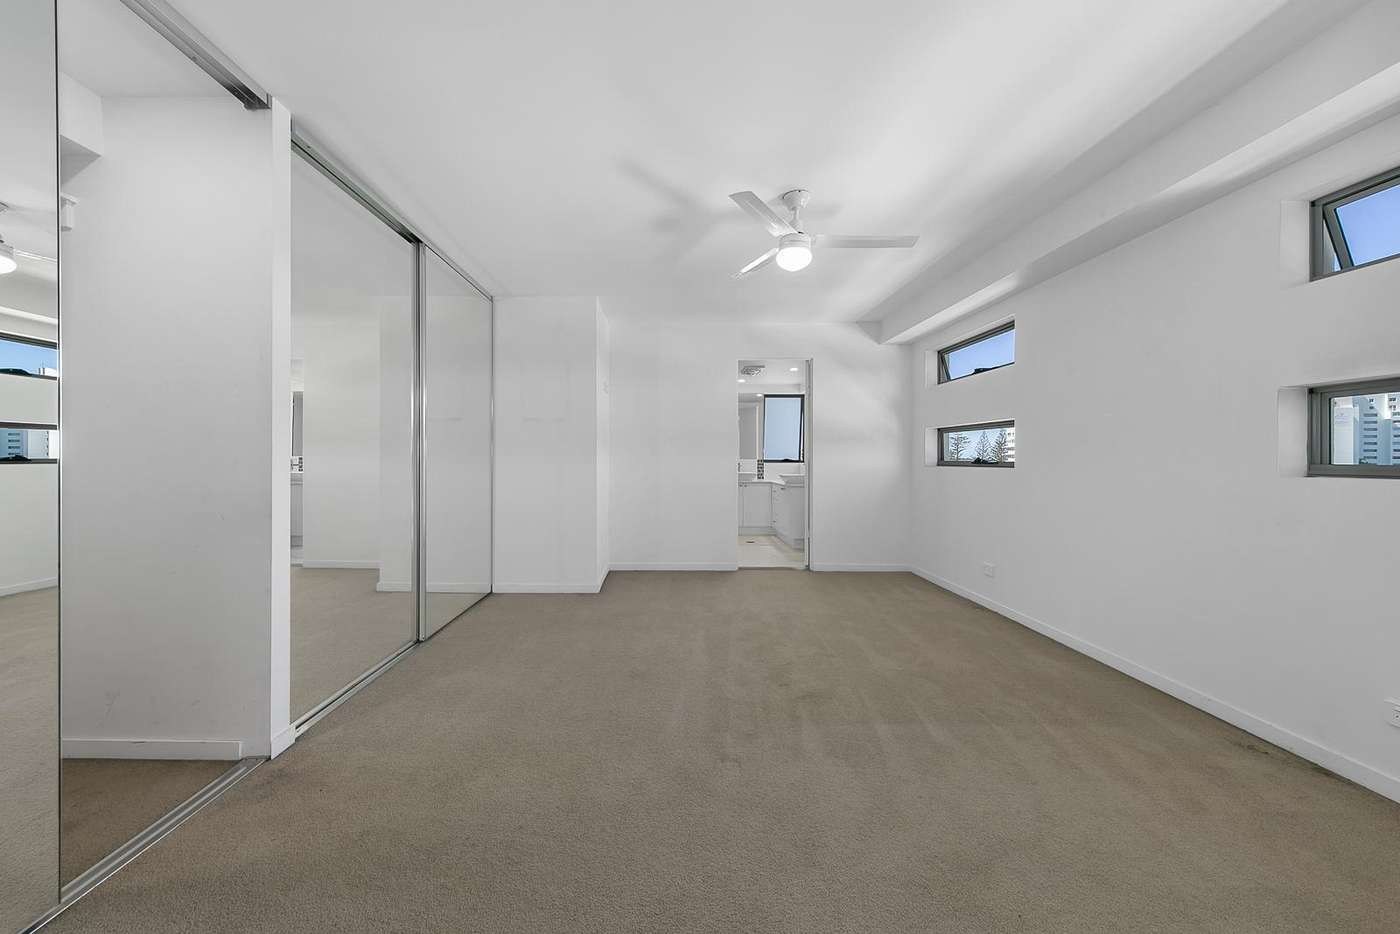 Sixth view of Homely apartment listing, 29/8 Bradford Street, Labrador QLD 4215